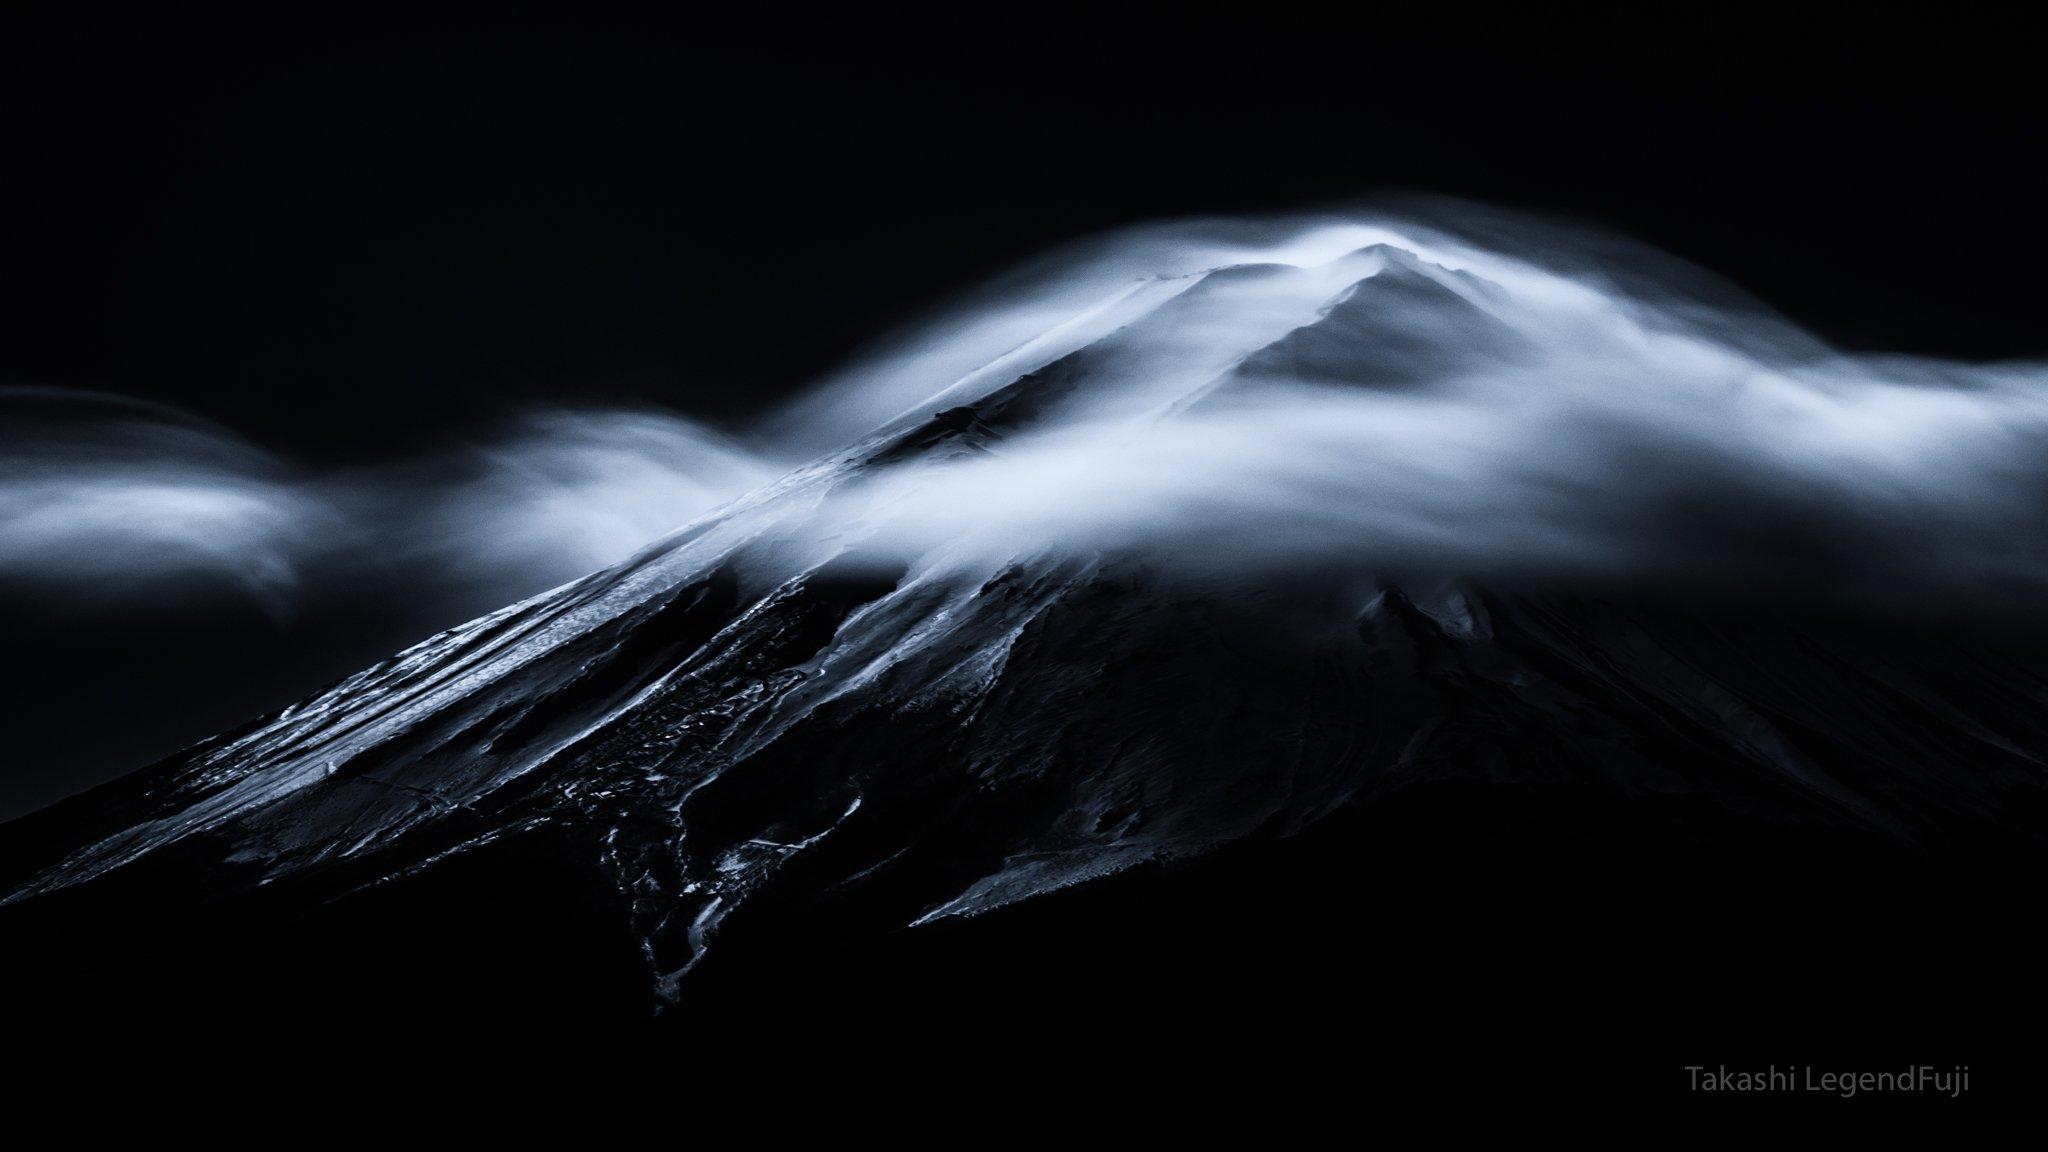 fuji,mountain,japan,clouds,sky,landscapes,snow,flow,time,amazing,beautiful,wonderful,black and white,monochrome,, Takashi